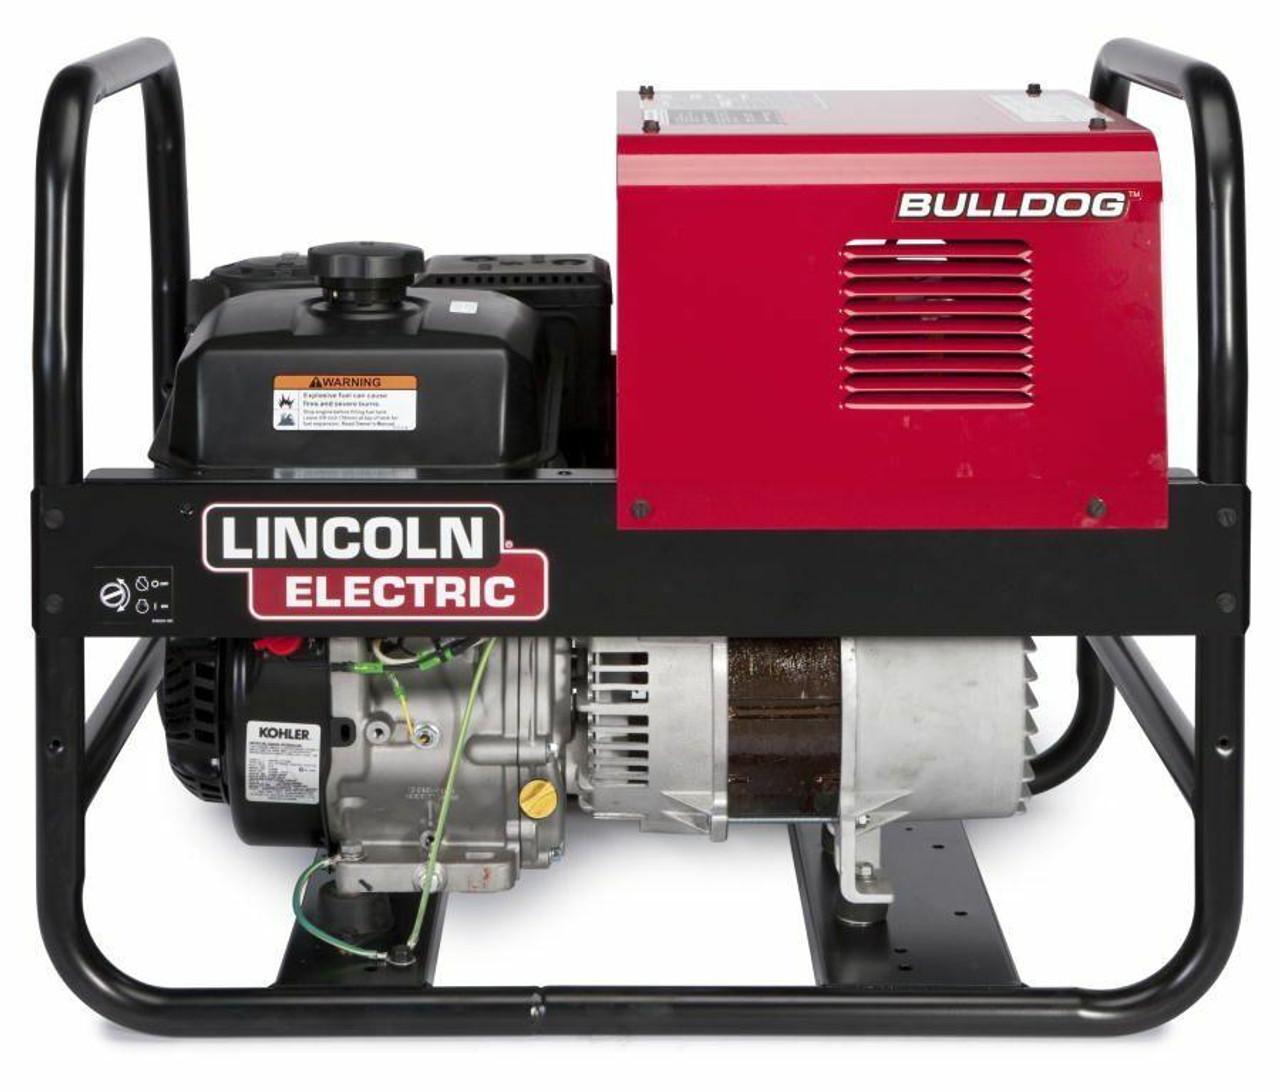 Lincoln Electric Lincoln Electric BULLDOG 5500 Engine Drive Welder KOHLER - K2708-2